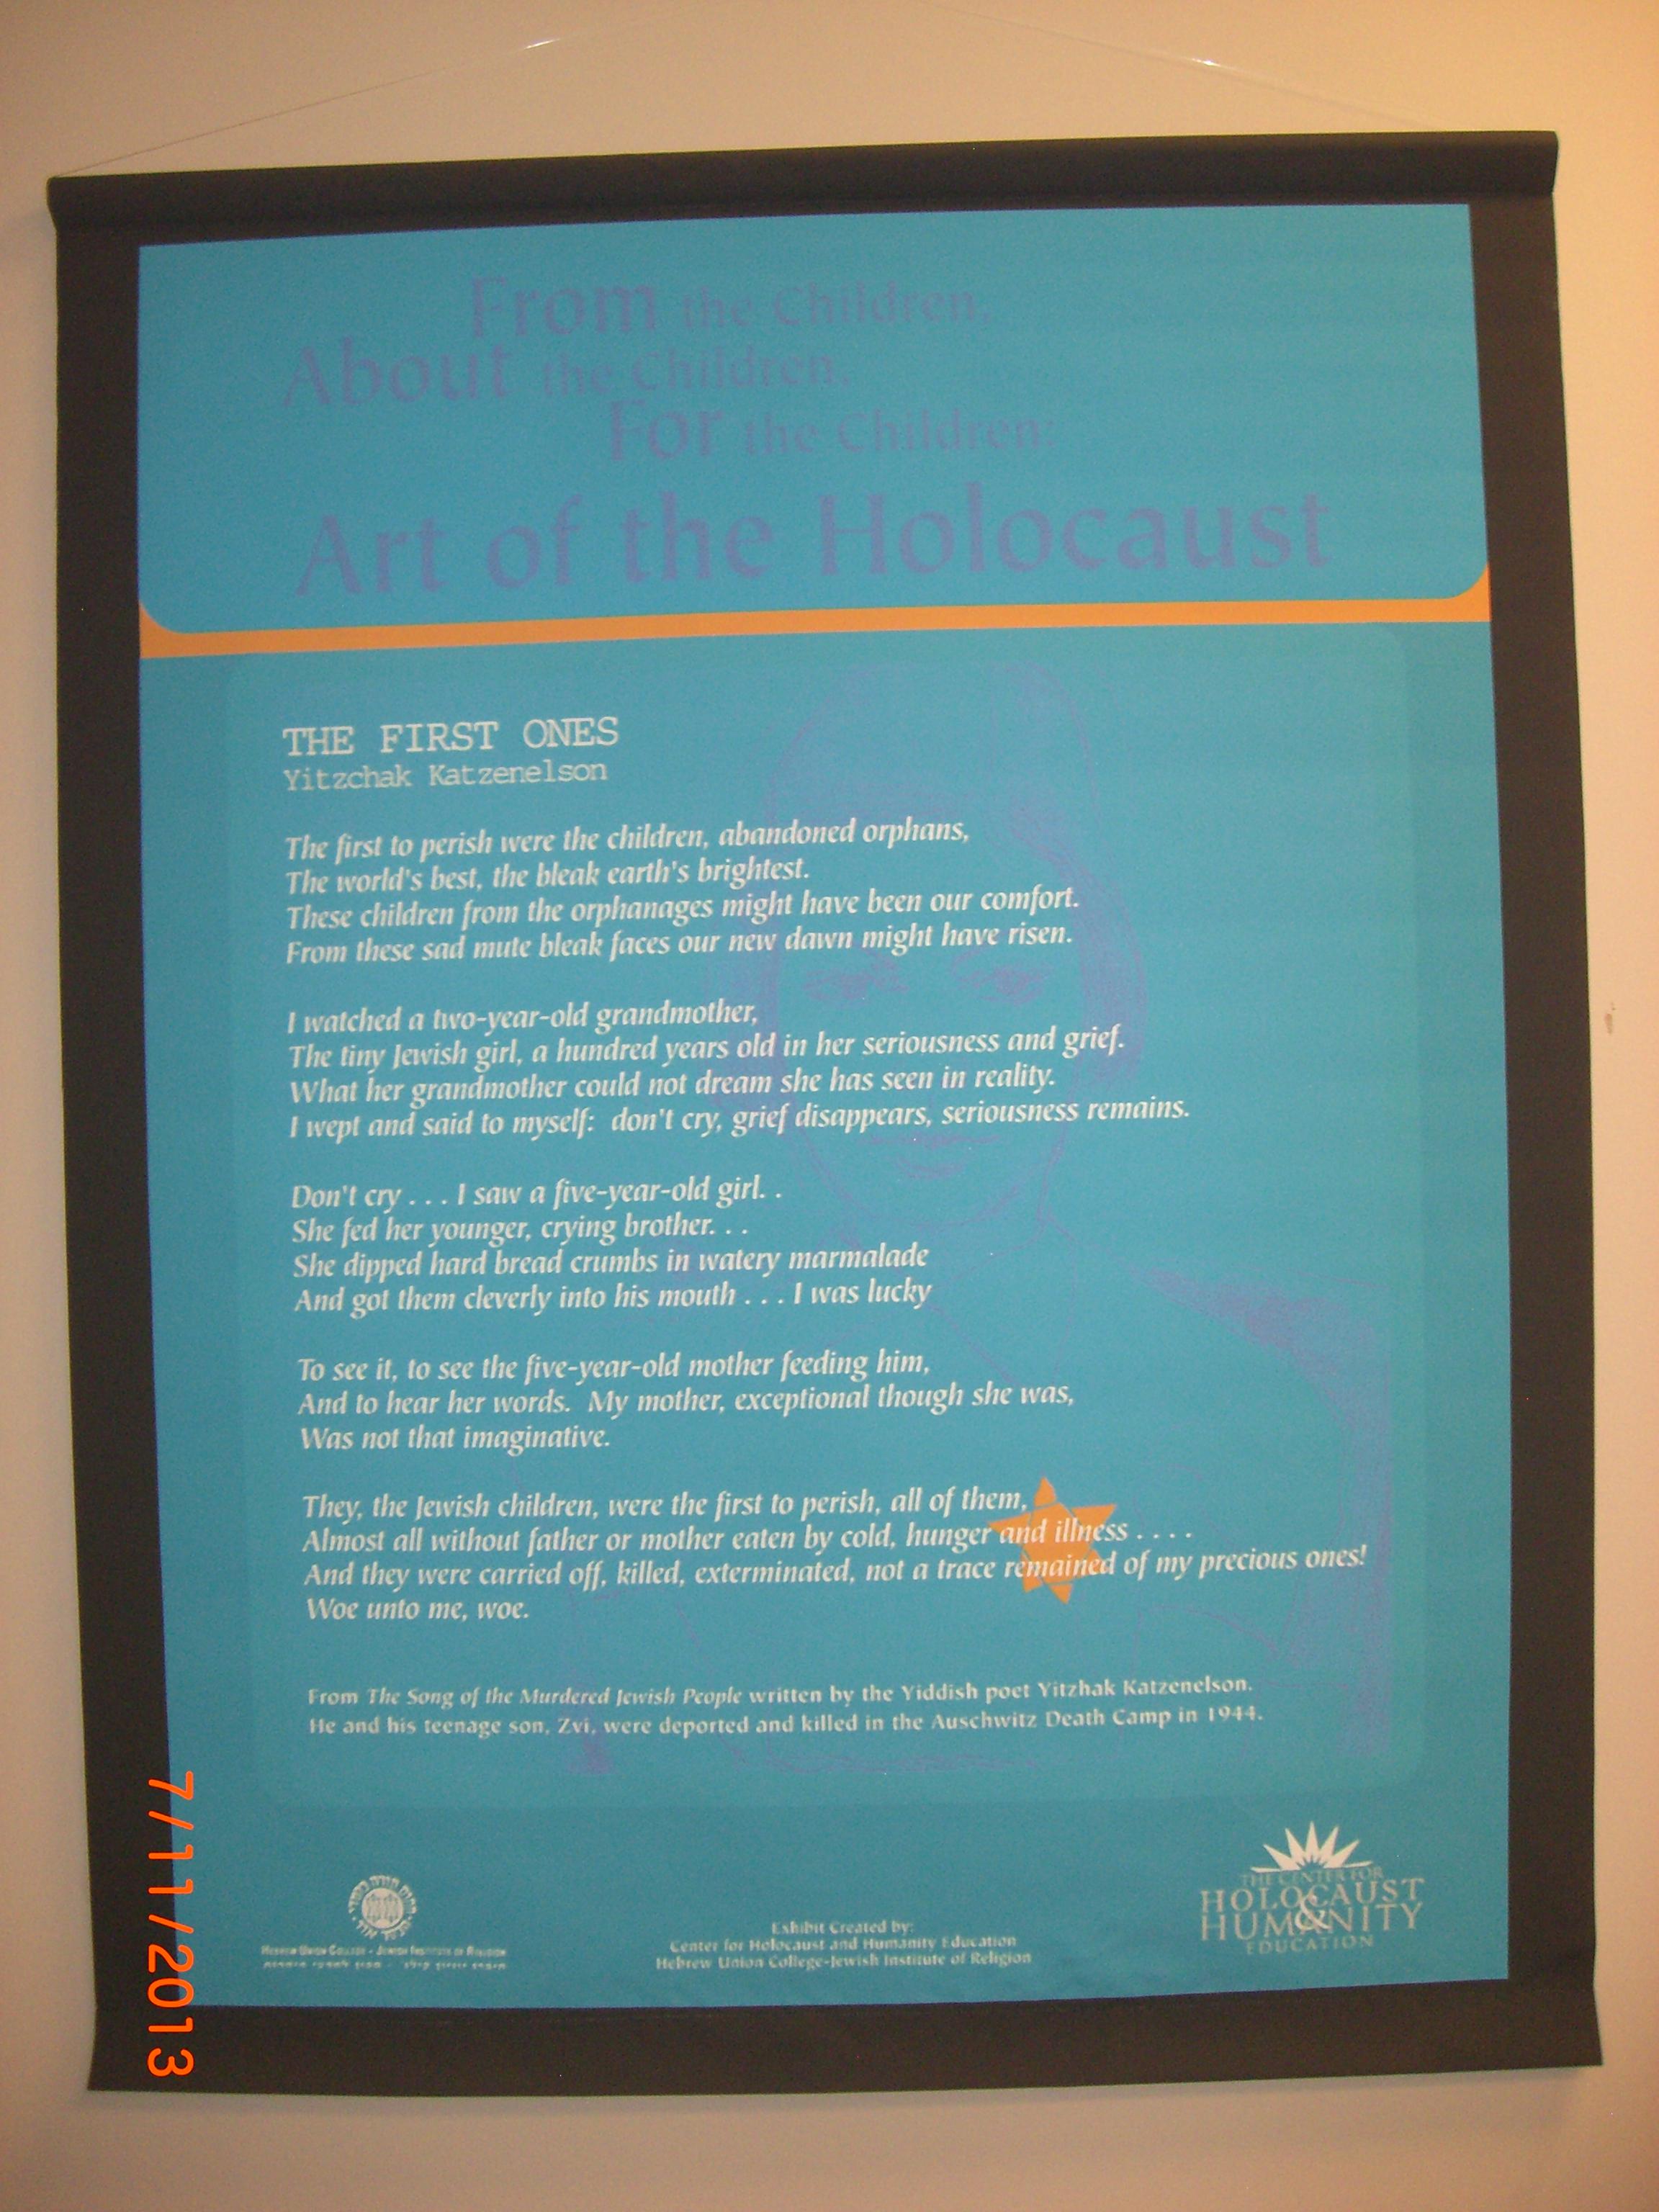 The First Ones: Lyrics